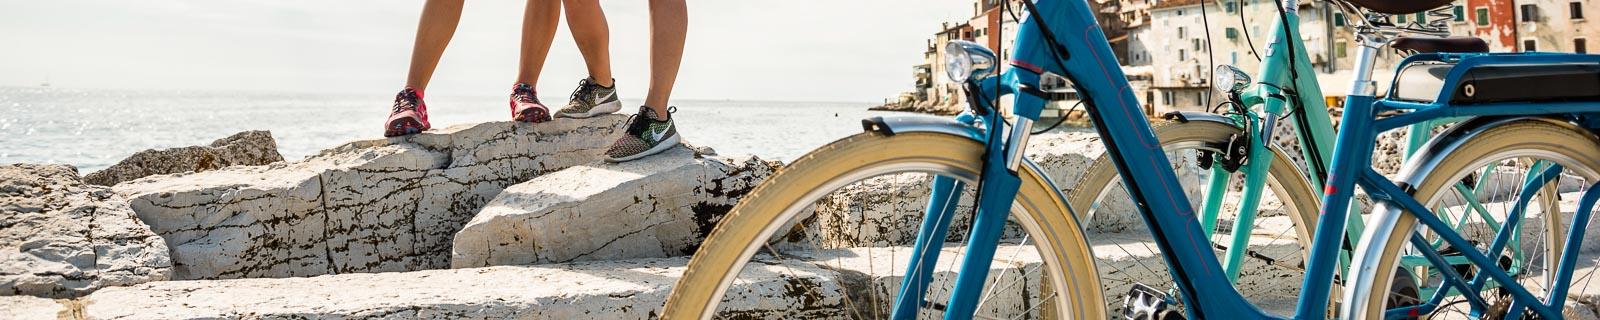 Biciclette da trekking per principianti